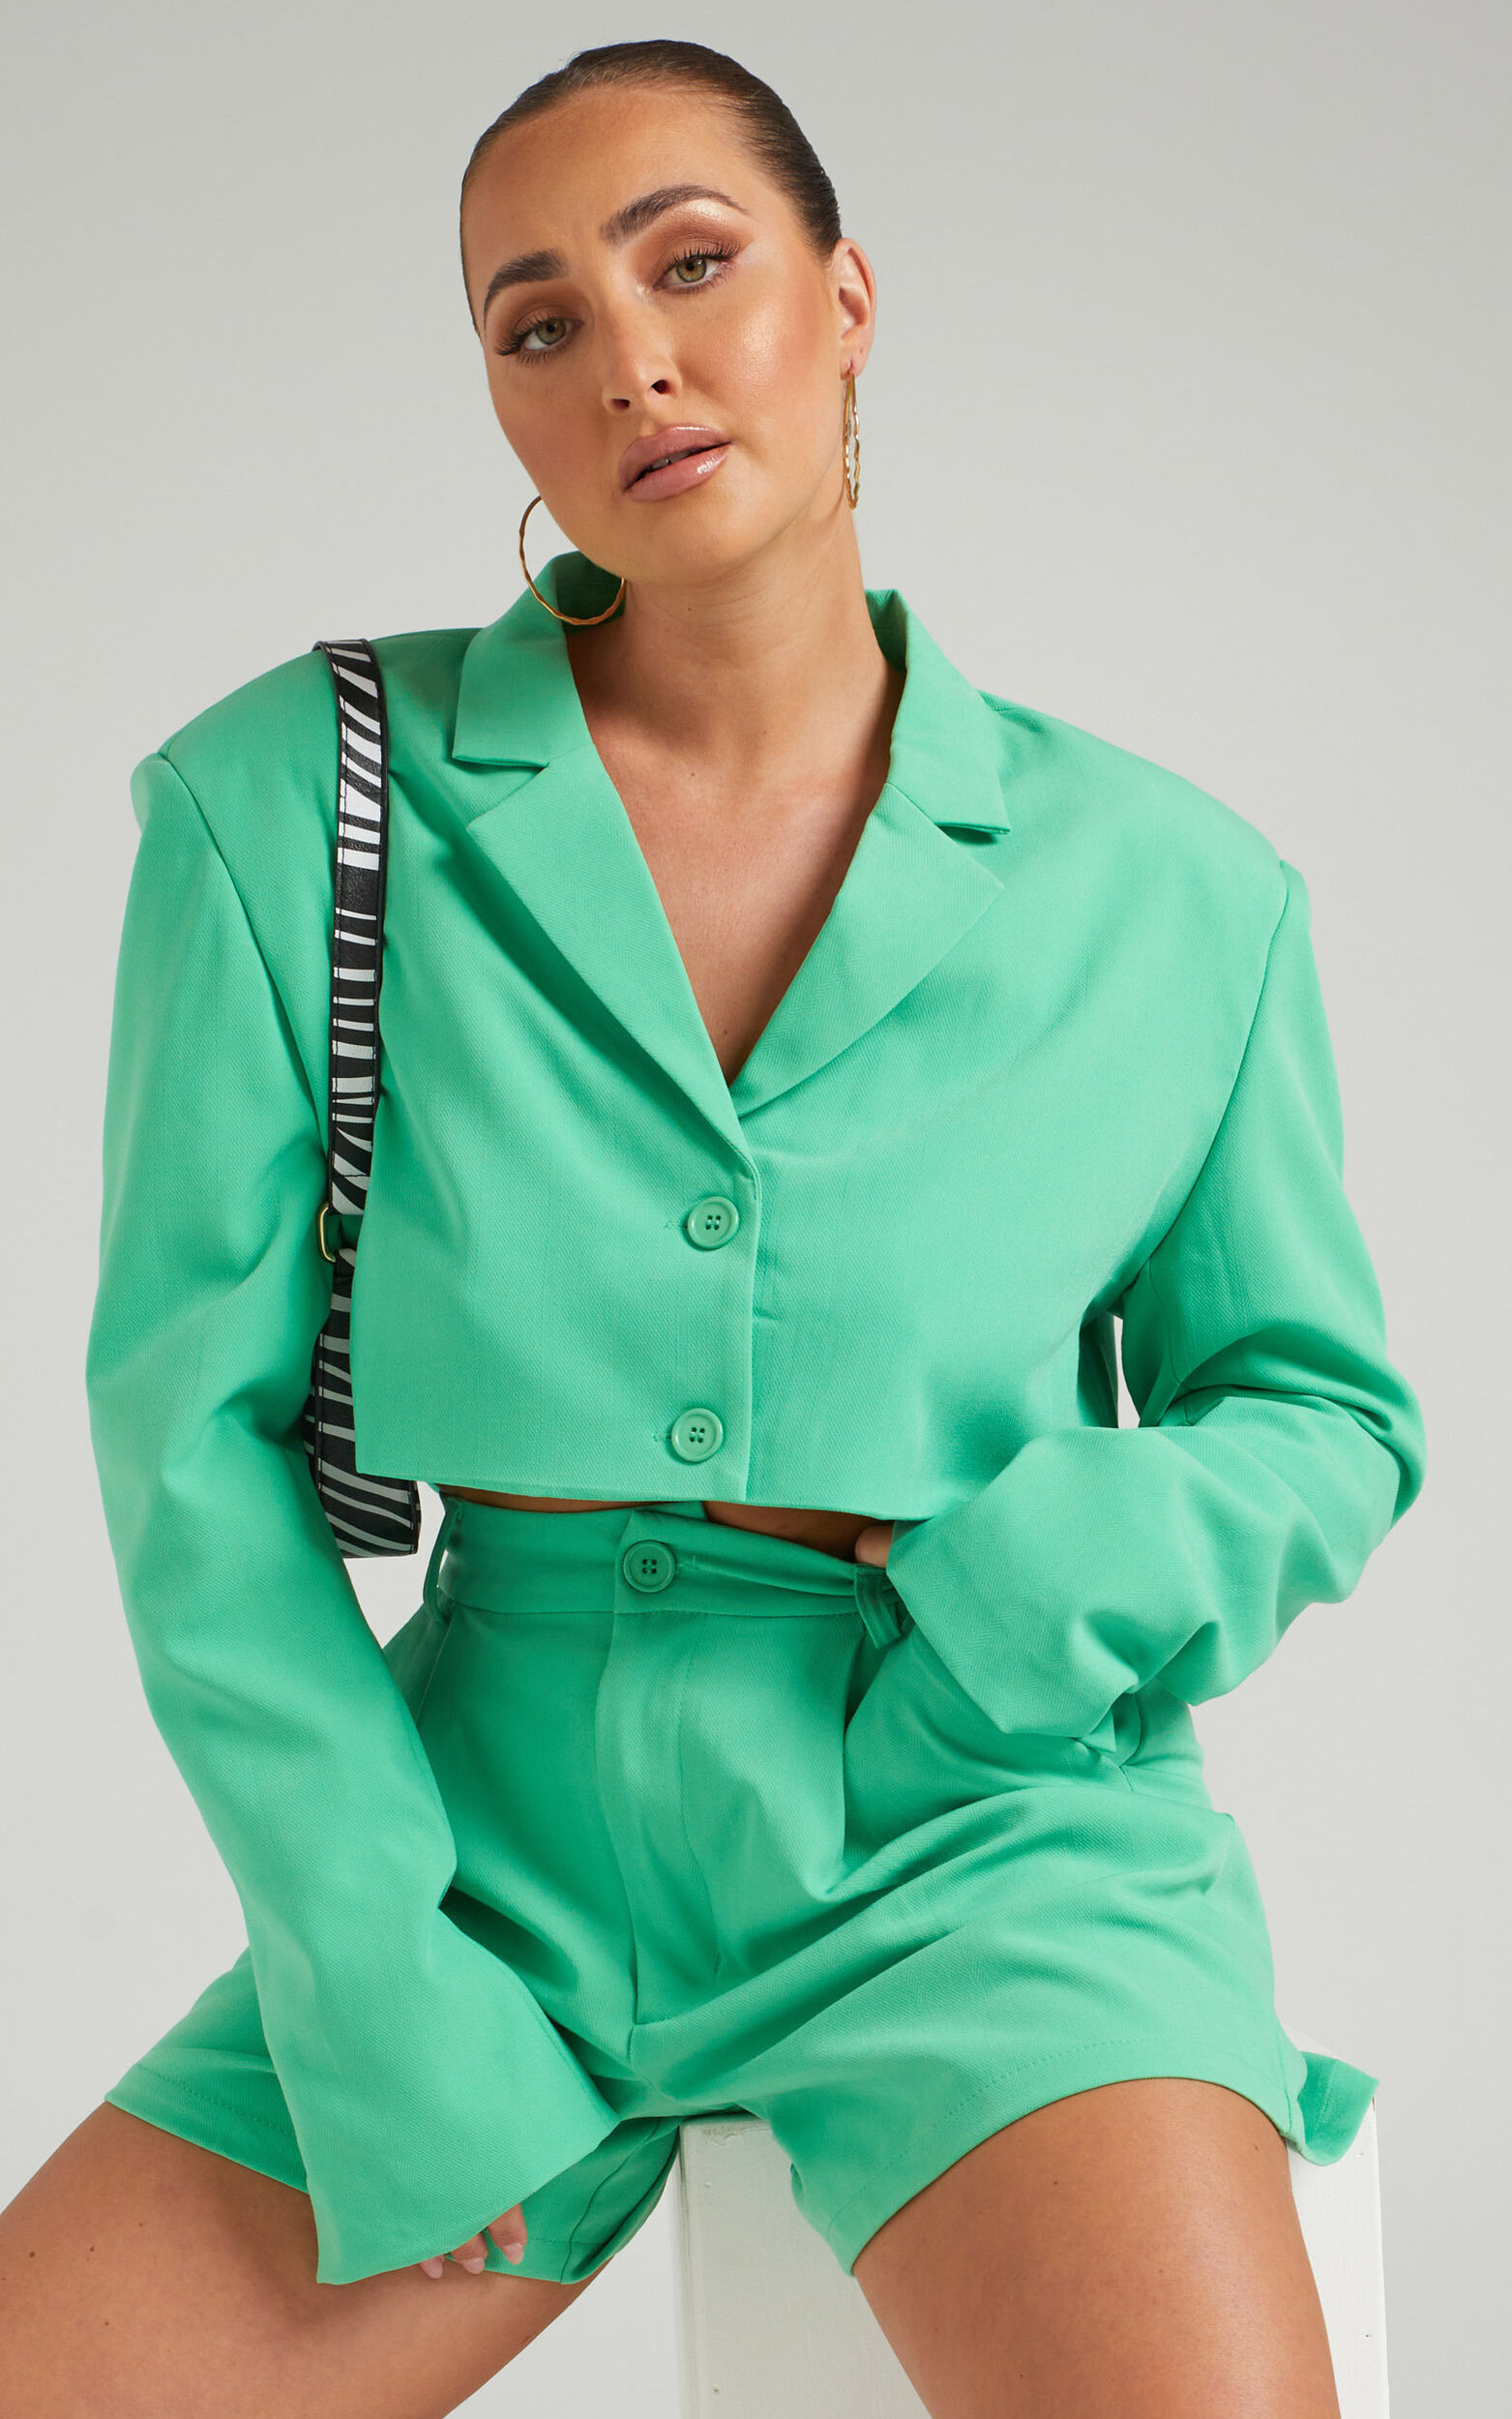 Danielle Bernstein - Cropped Stretch Herringbone Twill Blazer in Green - L, GRN1, super-hi-res image number null